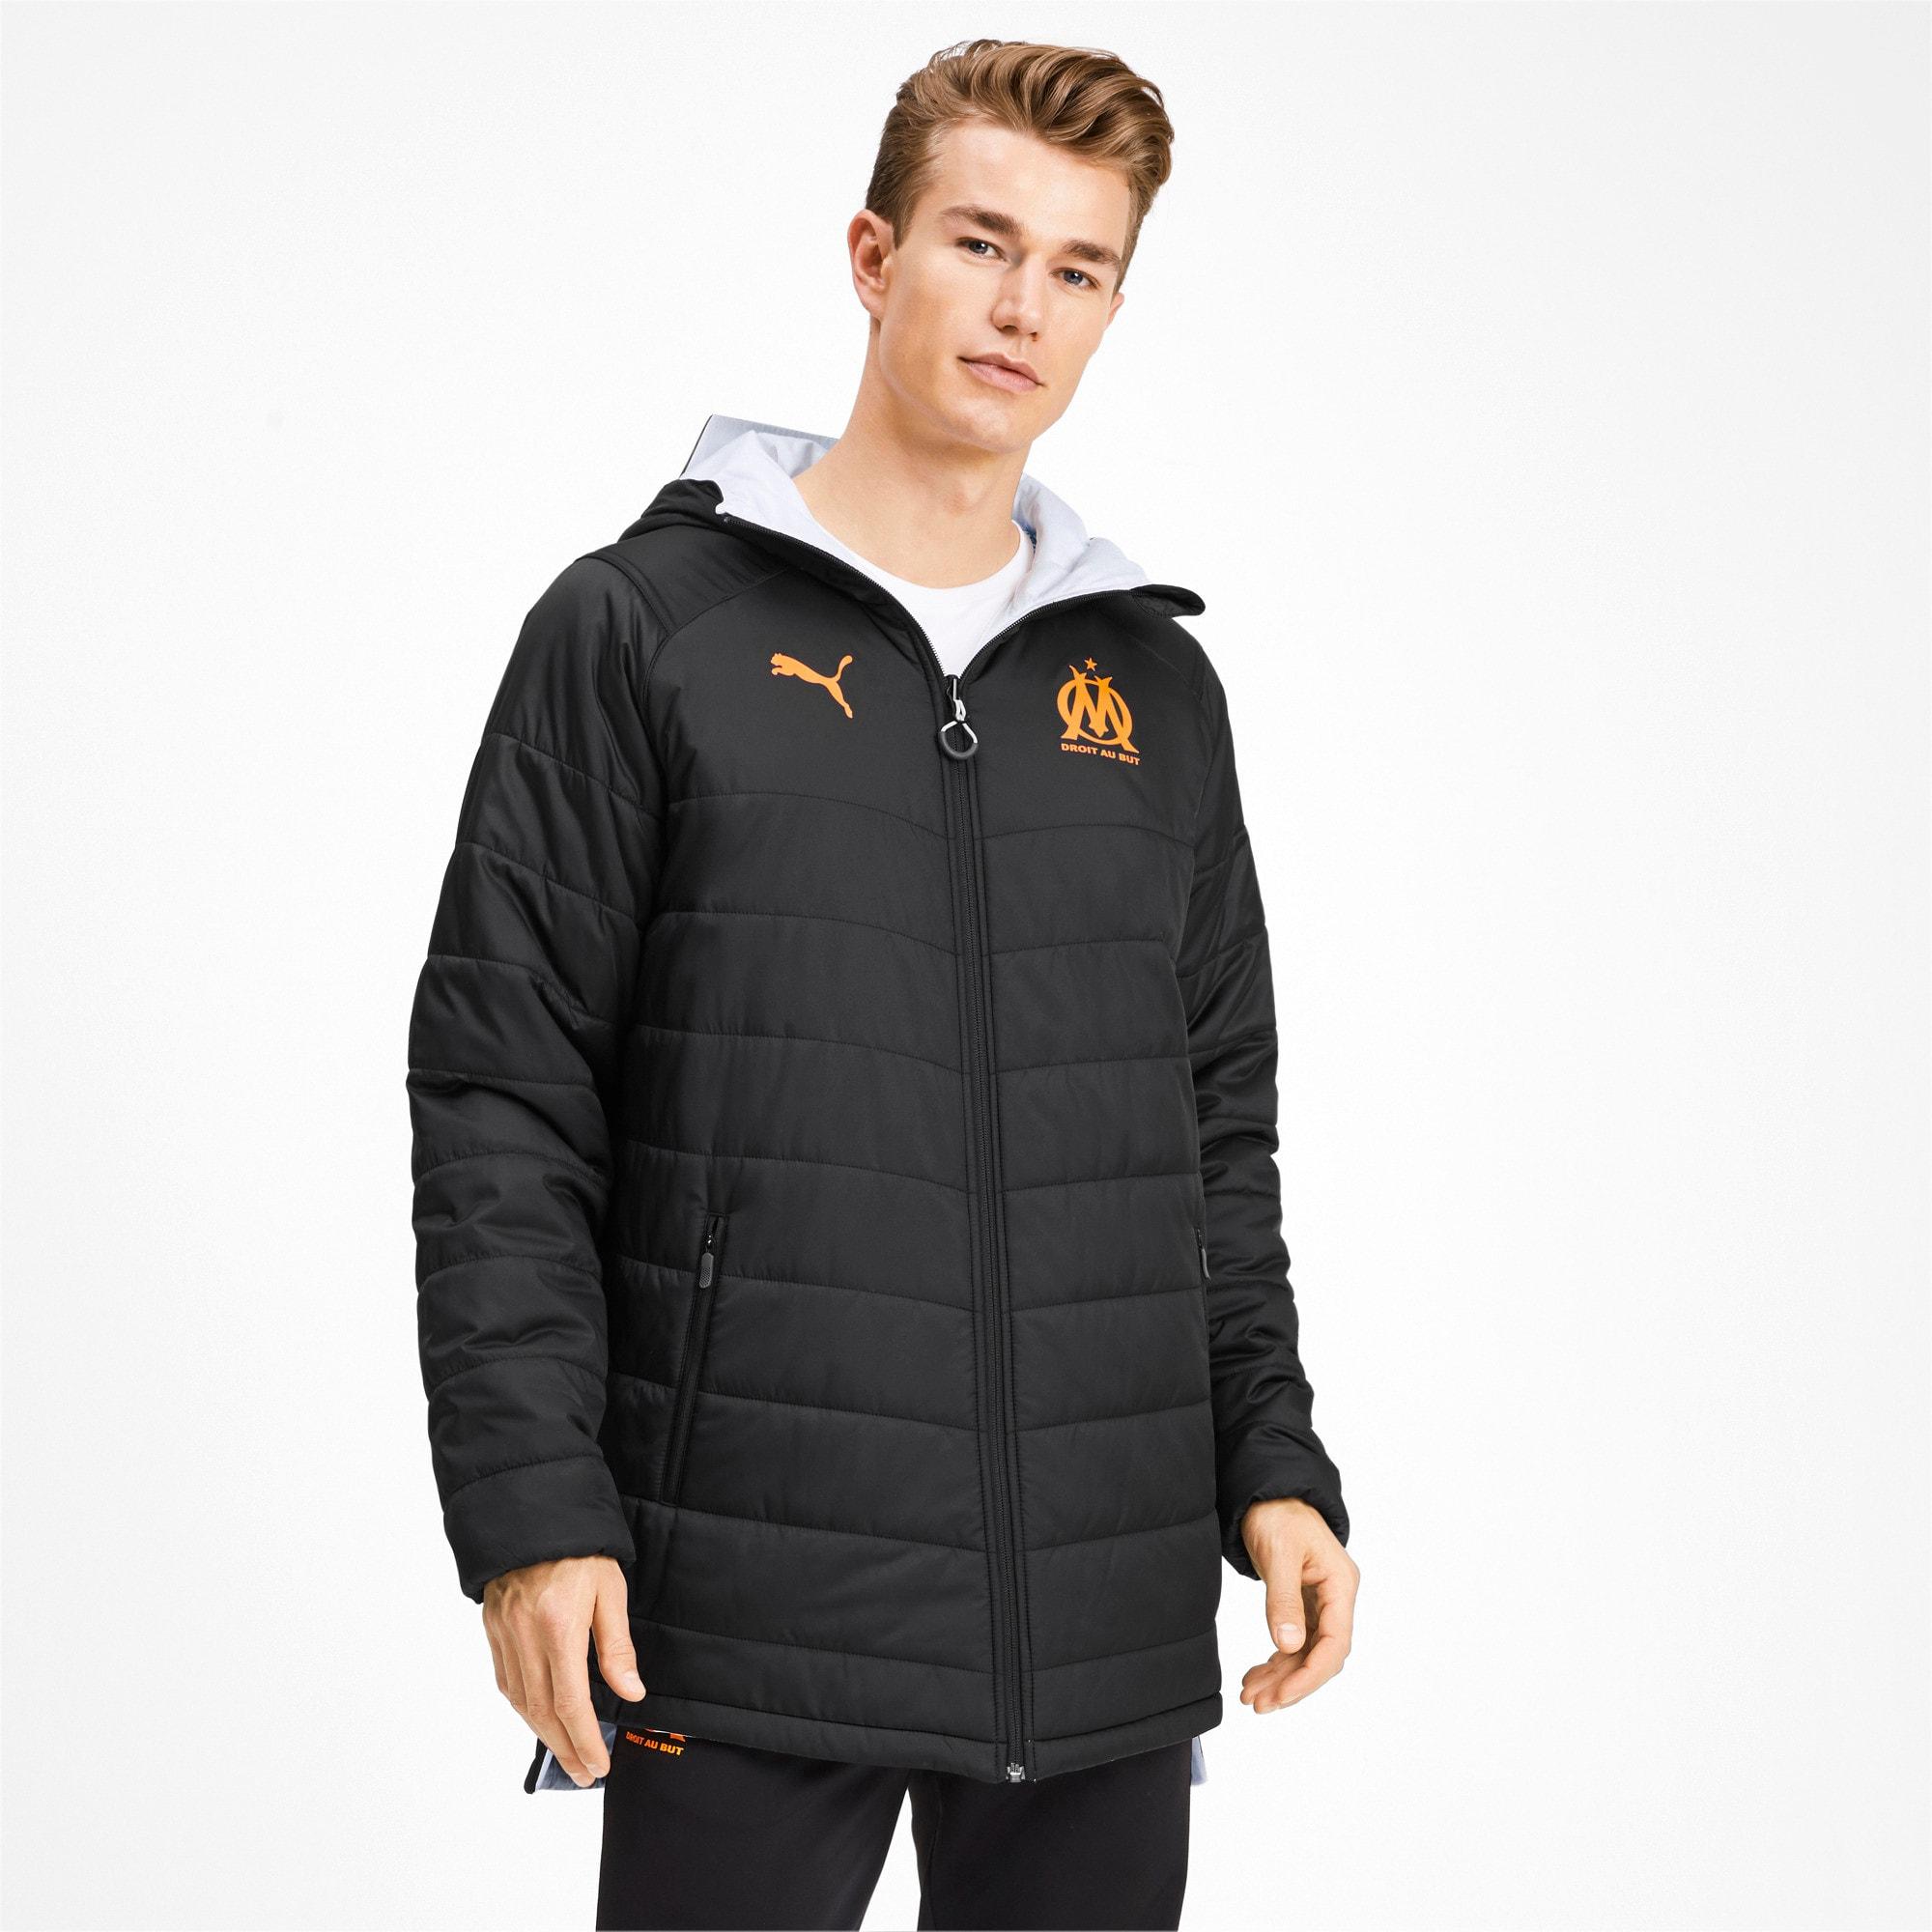 Thumbnail 1 of Olympique de Marseille Bench Men's Replica Reversible Jacket, Puma Black-Orange Popsicle, medium